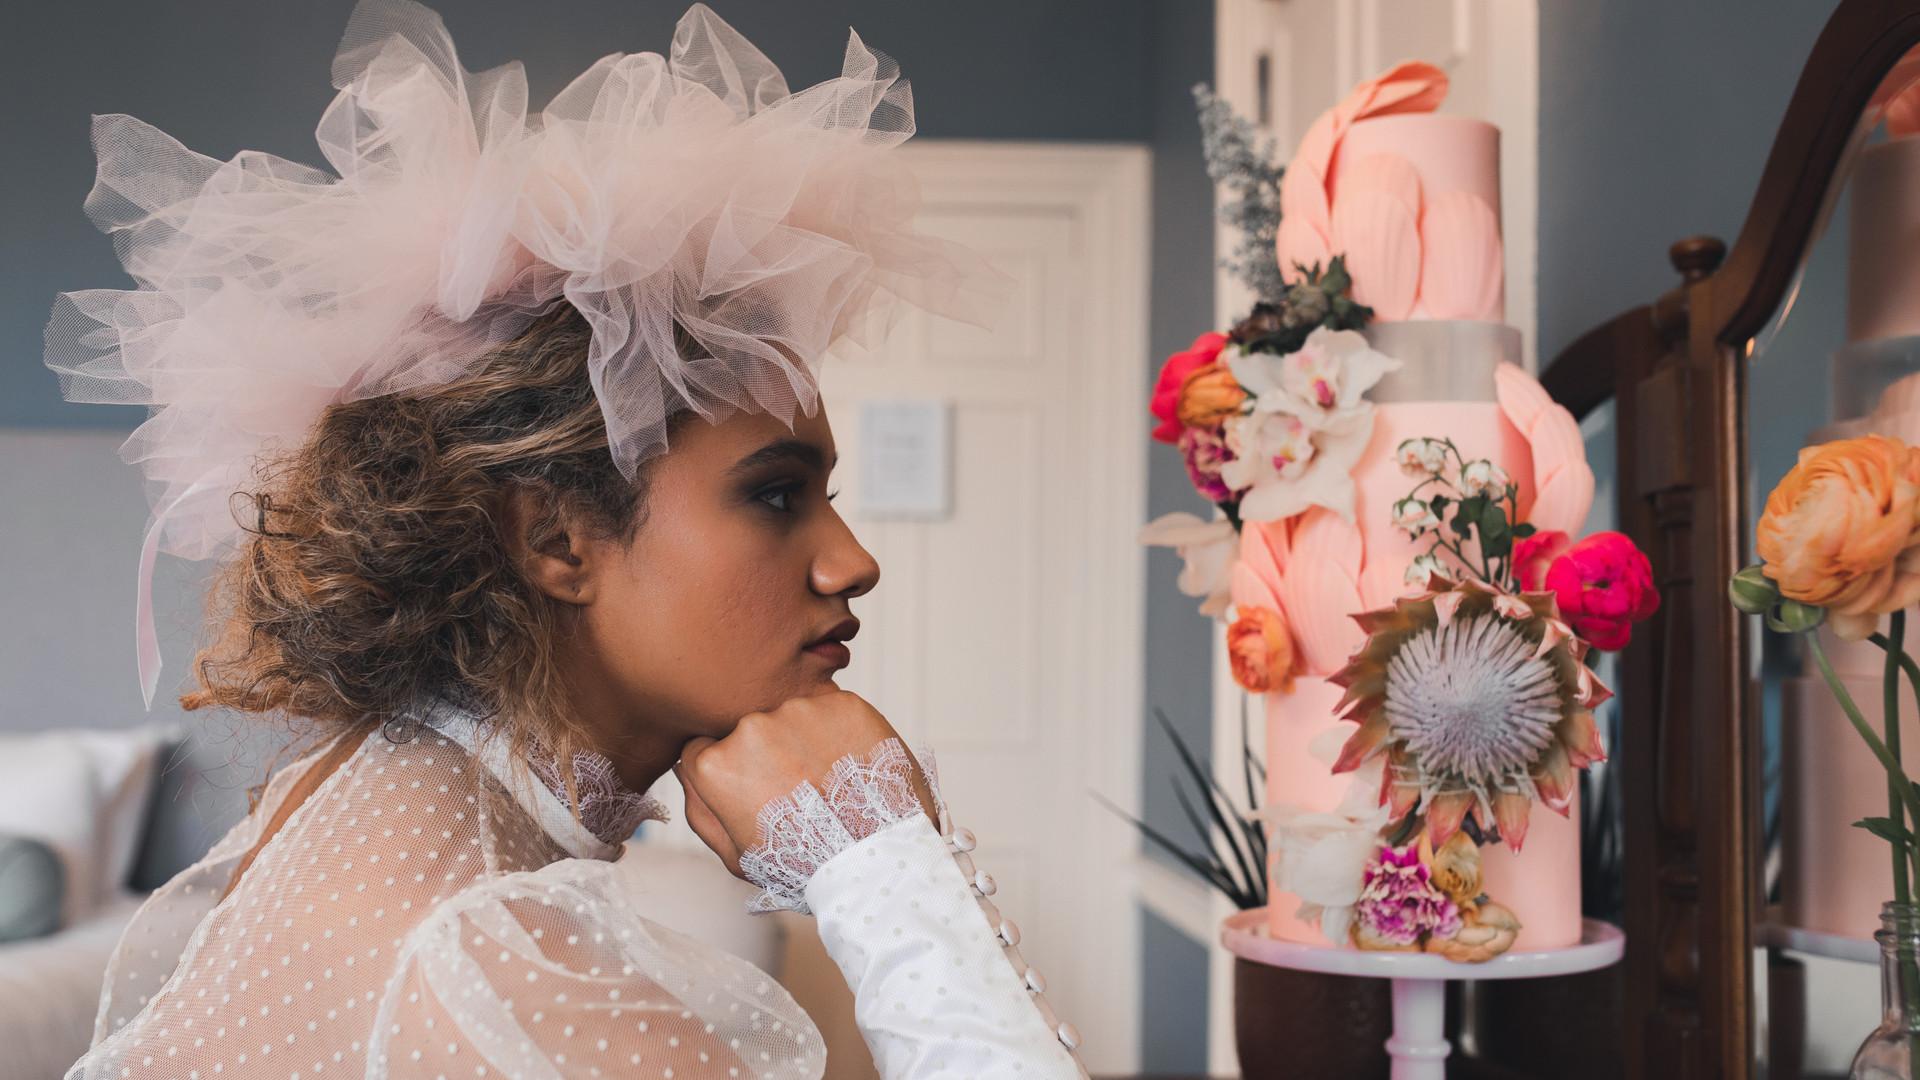 Modern Contemporary Wedding at Deer Park Hotel, Honiton, Devon.